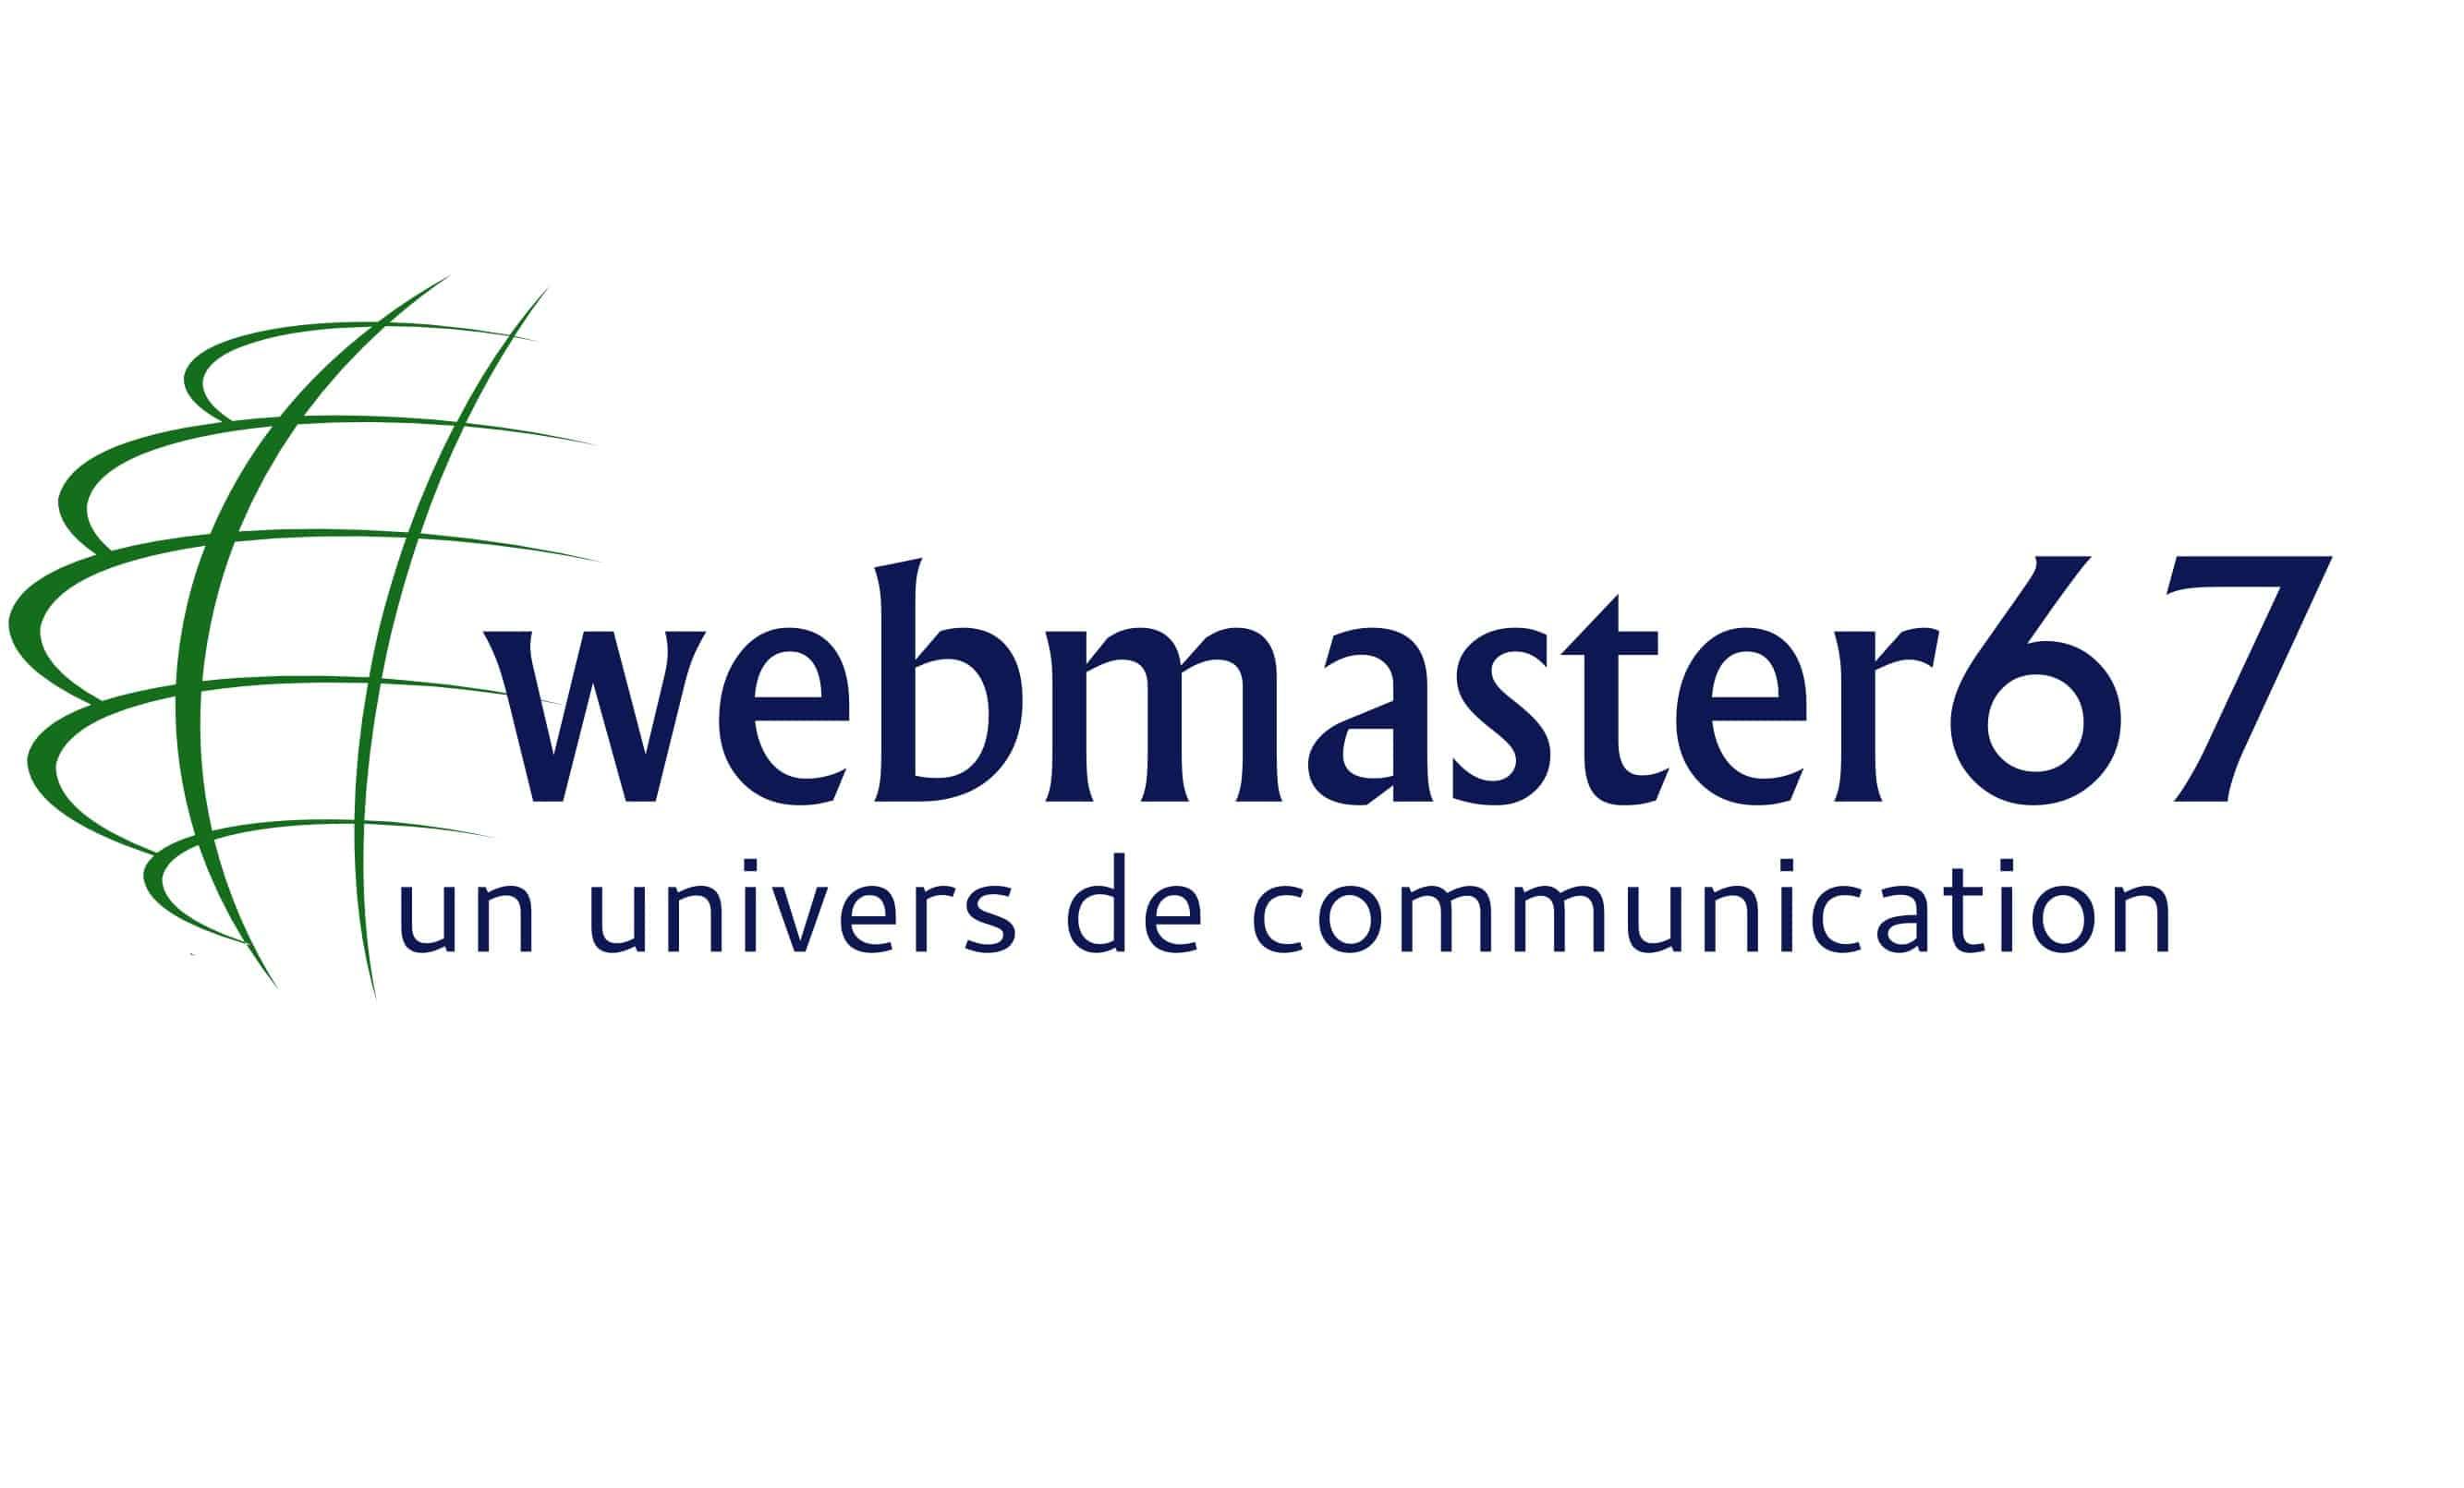 webmaster67